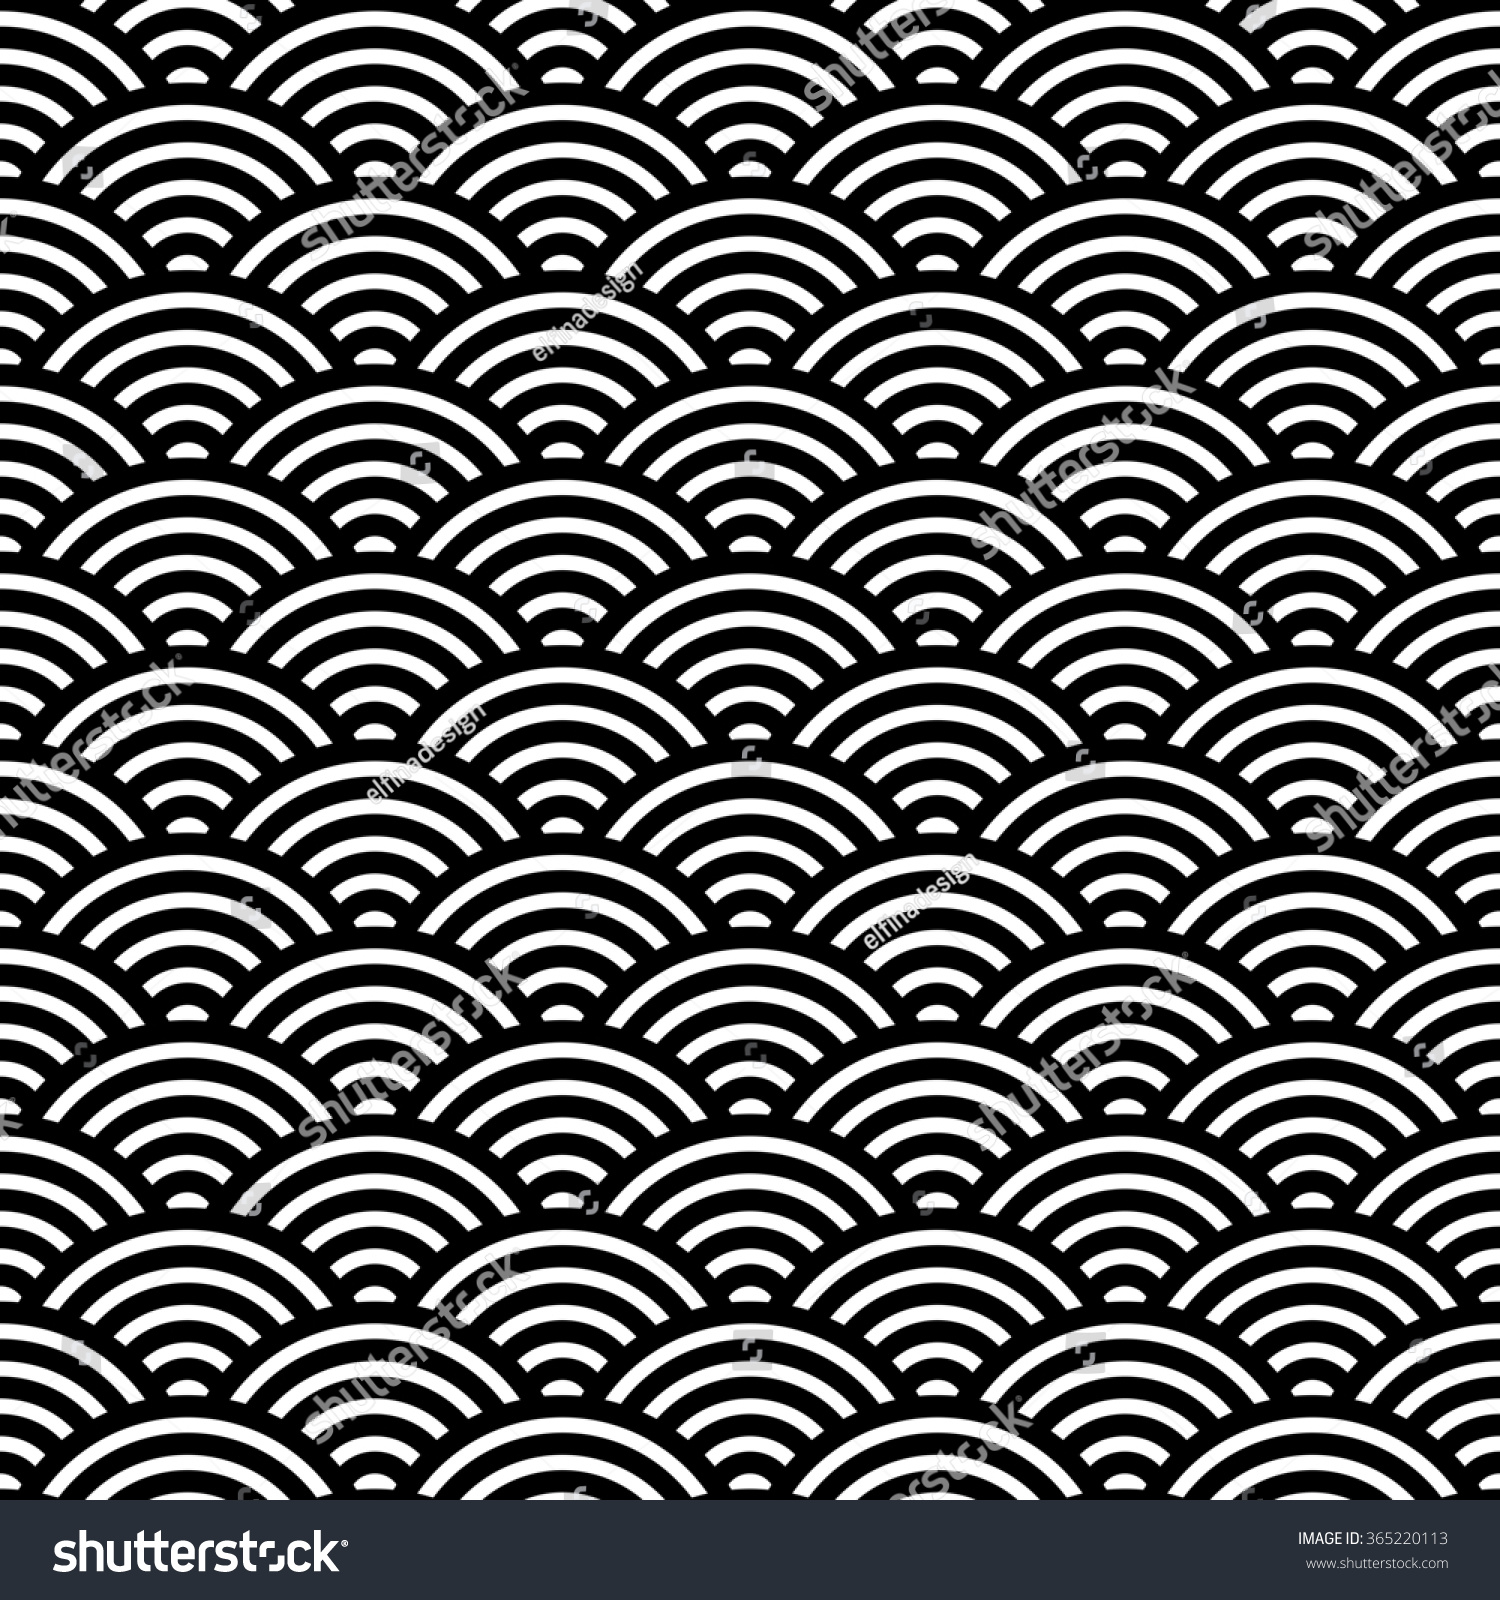 Japanese Fan Pattern Vector Illustration Asian Stock ...